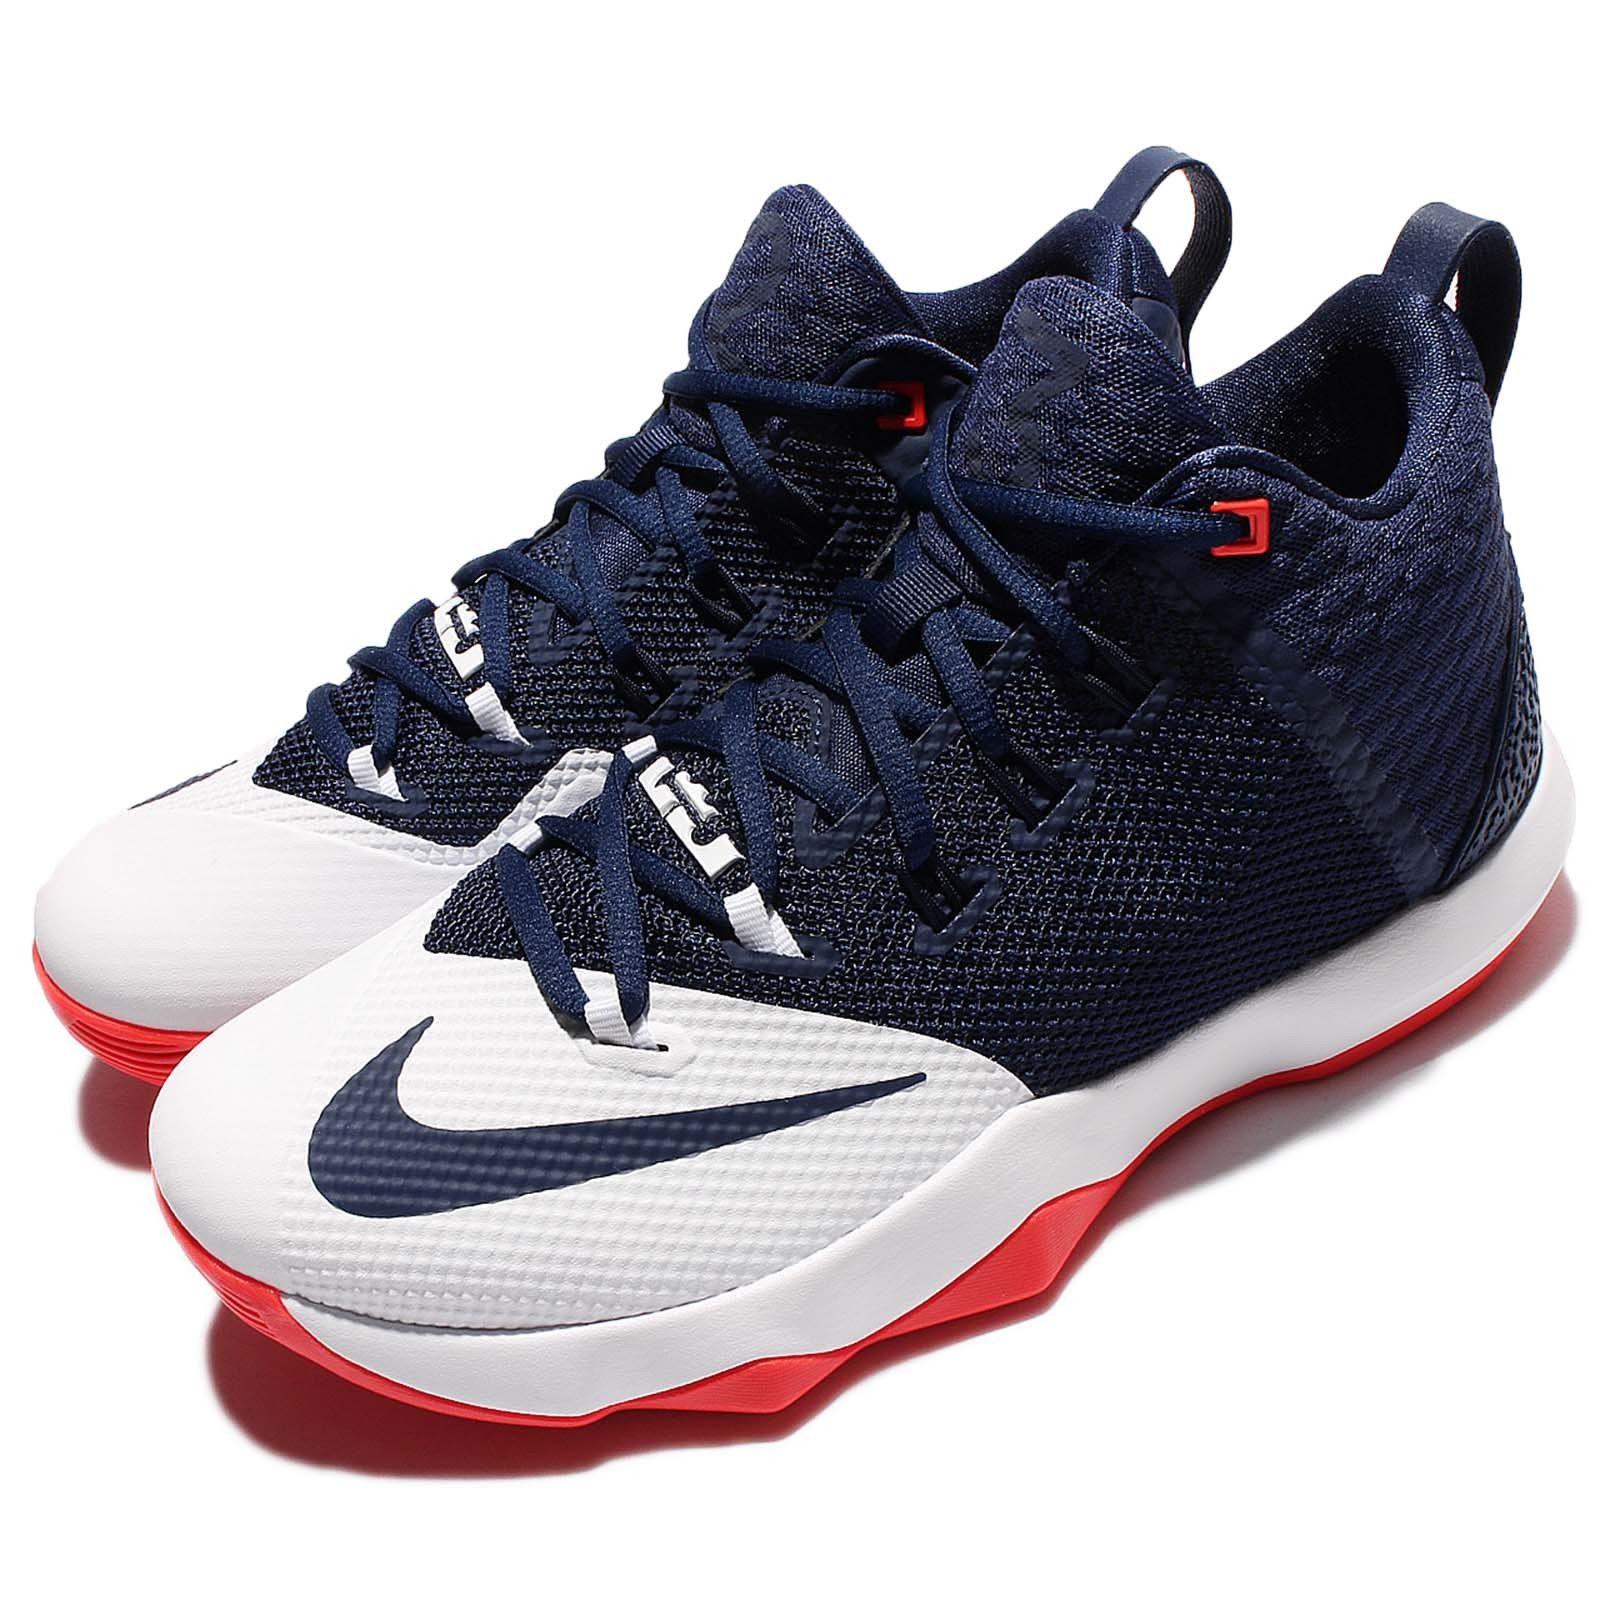 The Nike Zoom LeBron Ambassador IX Gets